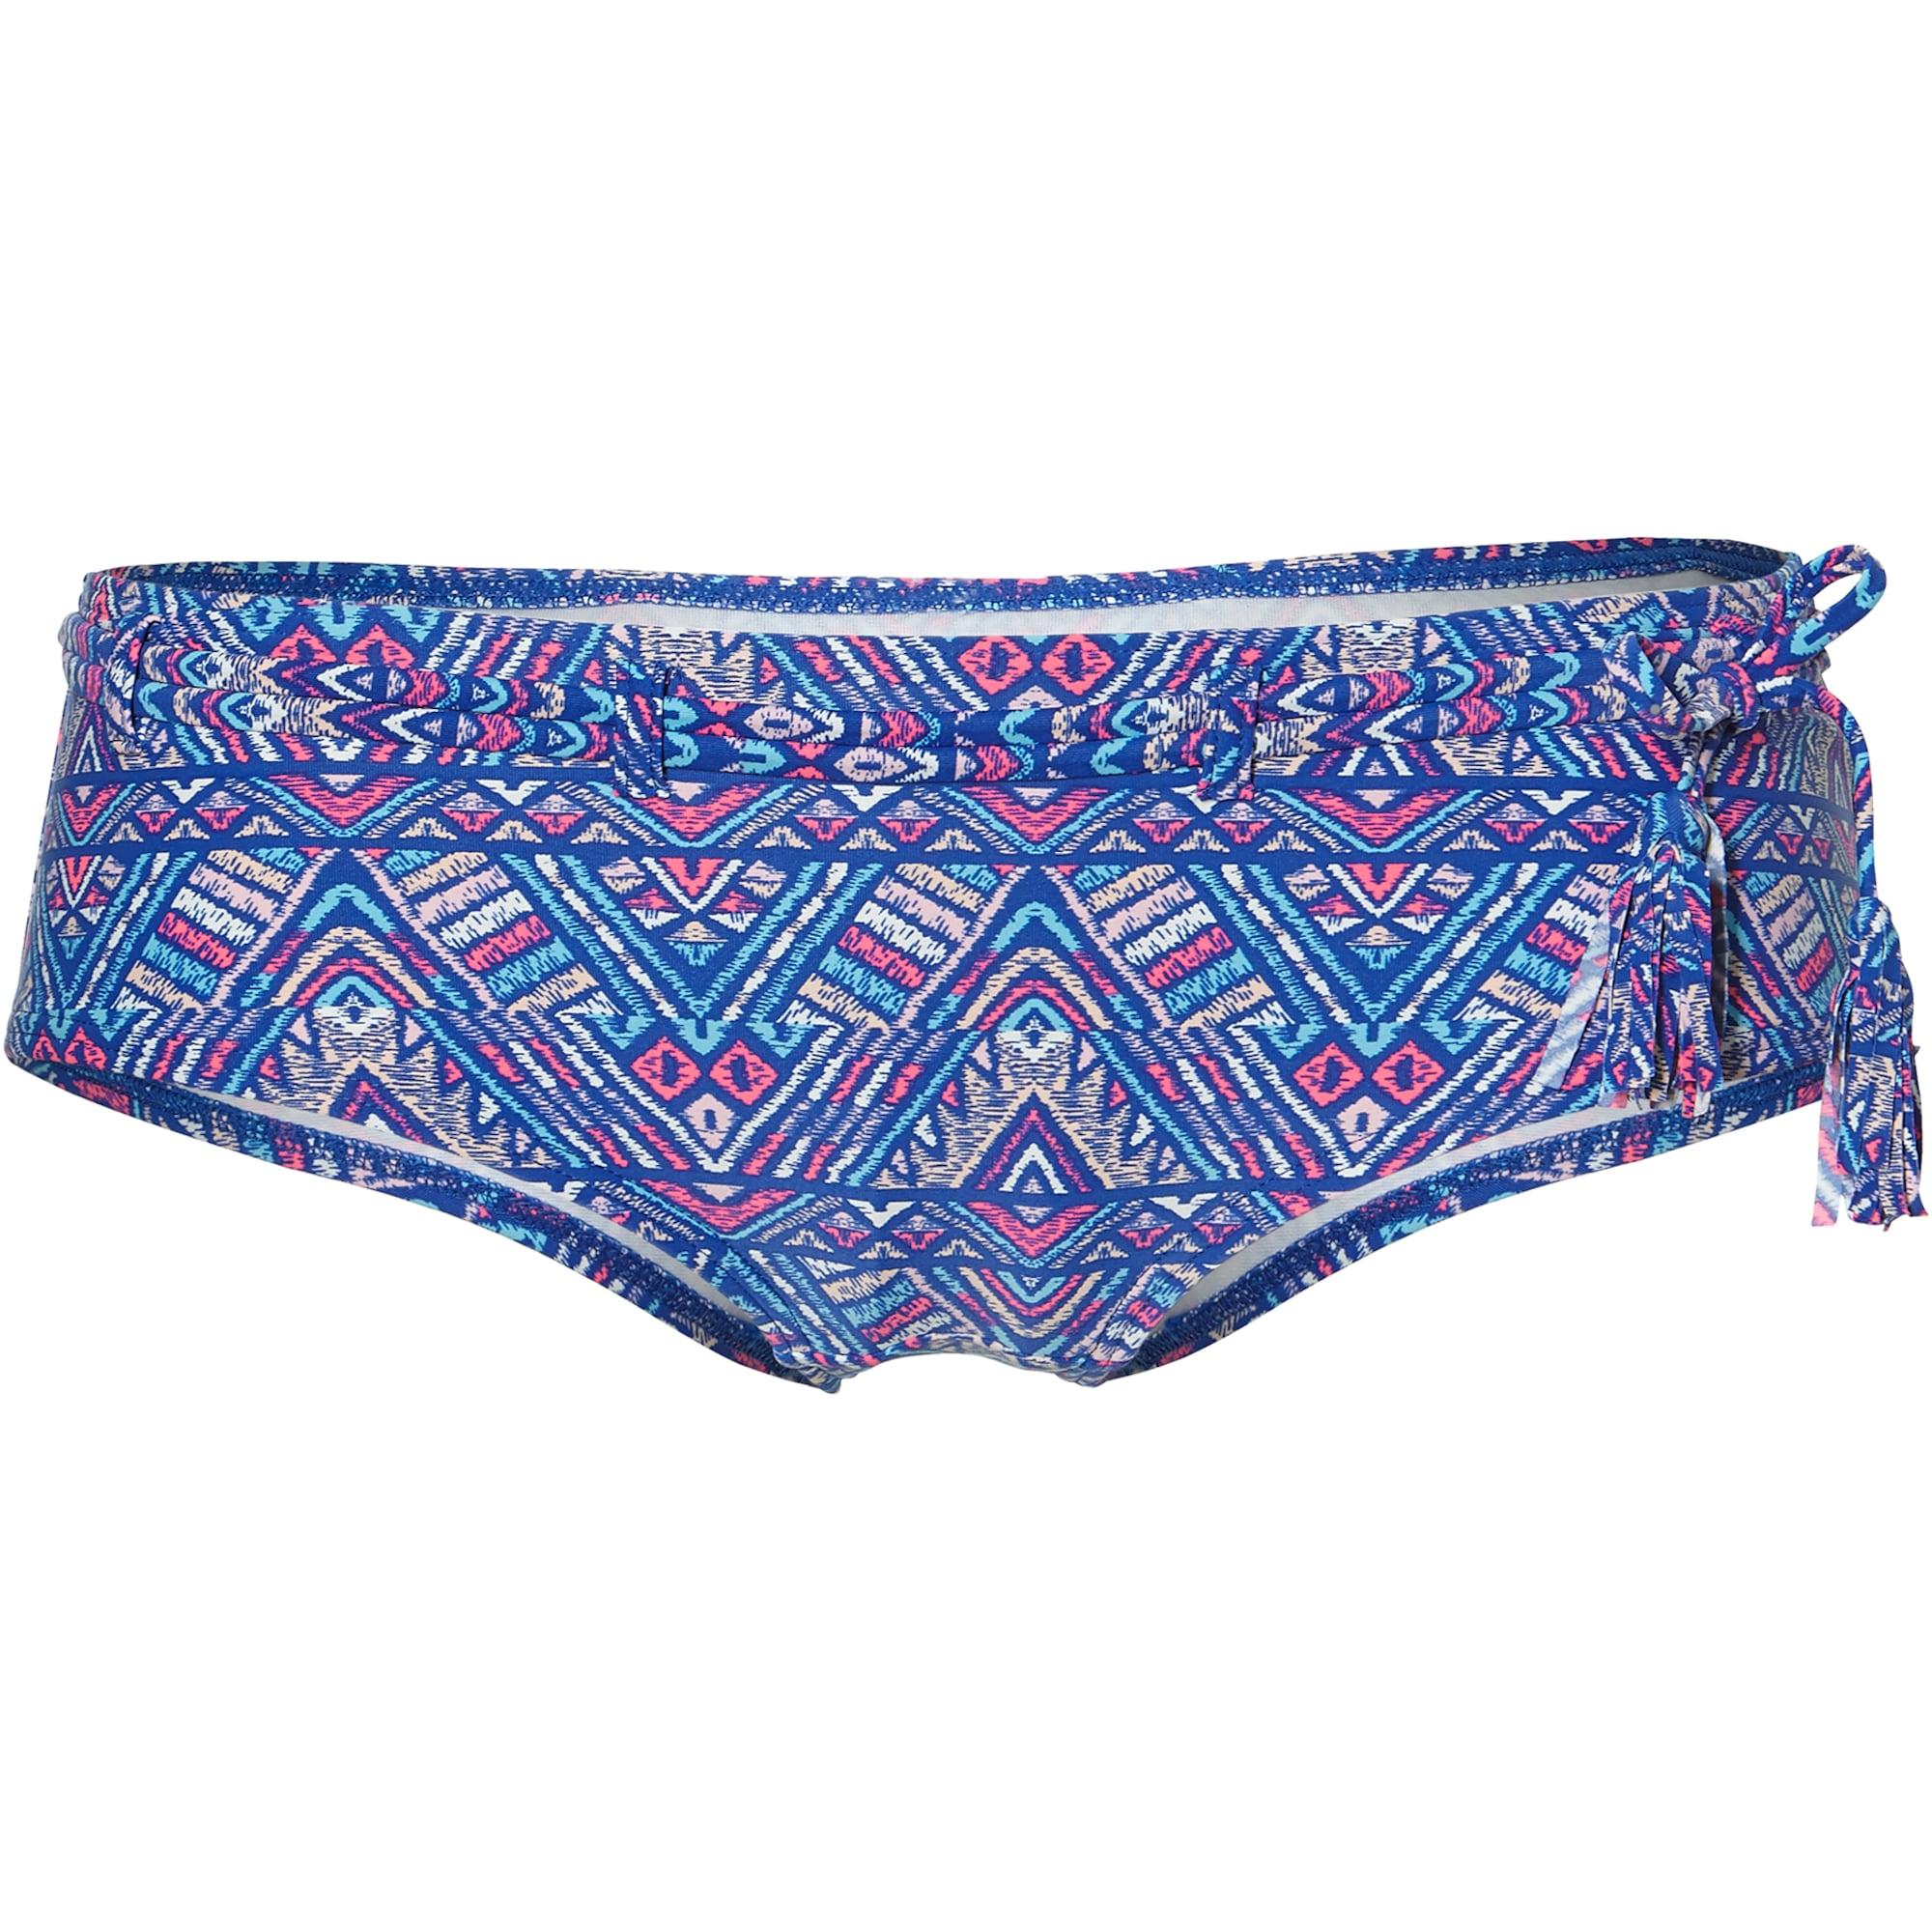 ONEILL Spodní díl plavek PW PRINT SHORTY BOTTOM  modrá  pink O'NEILL